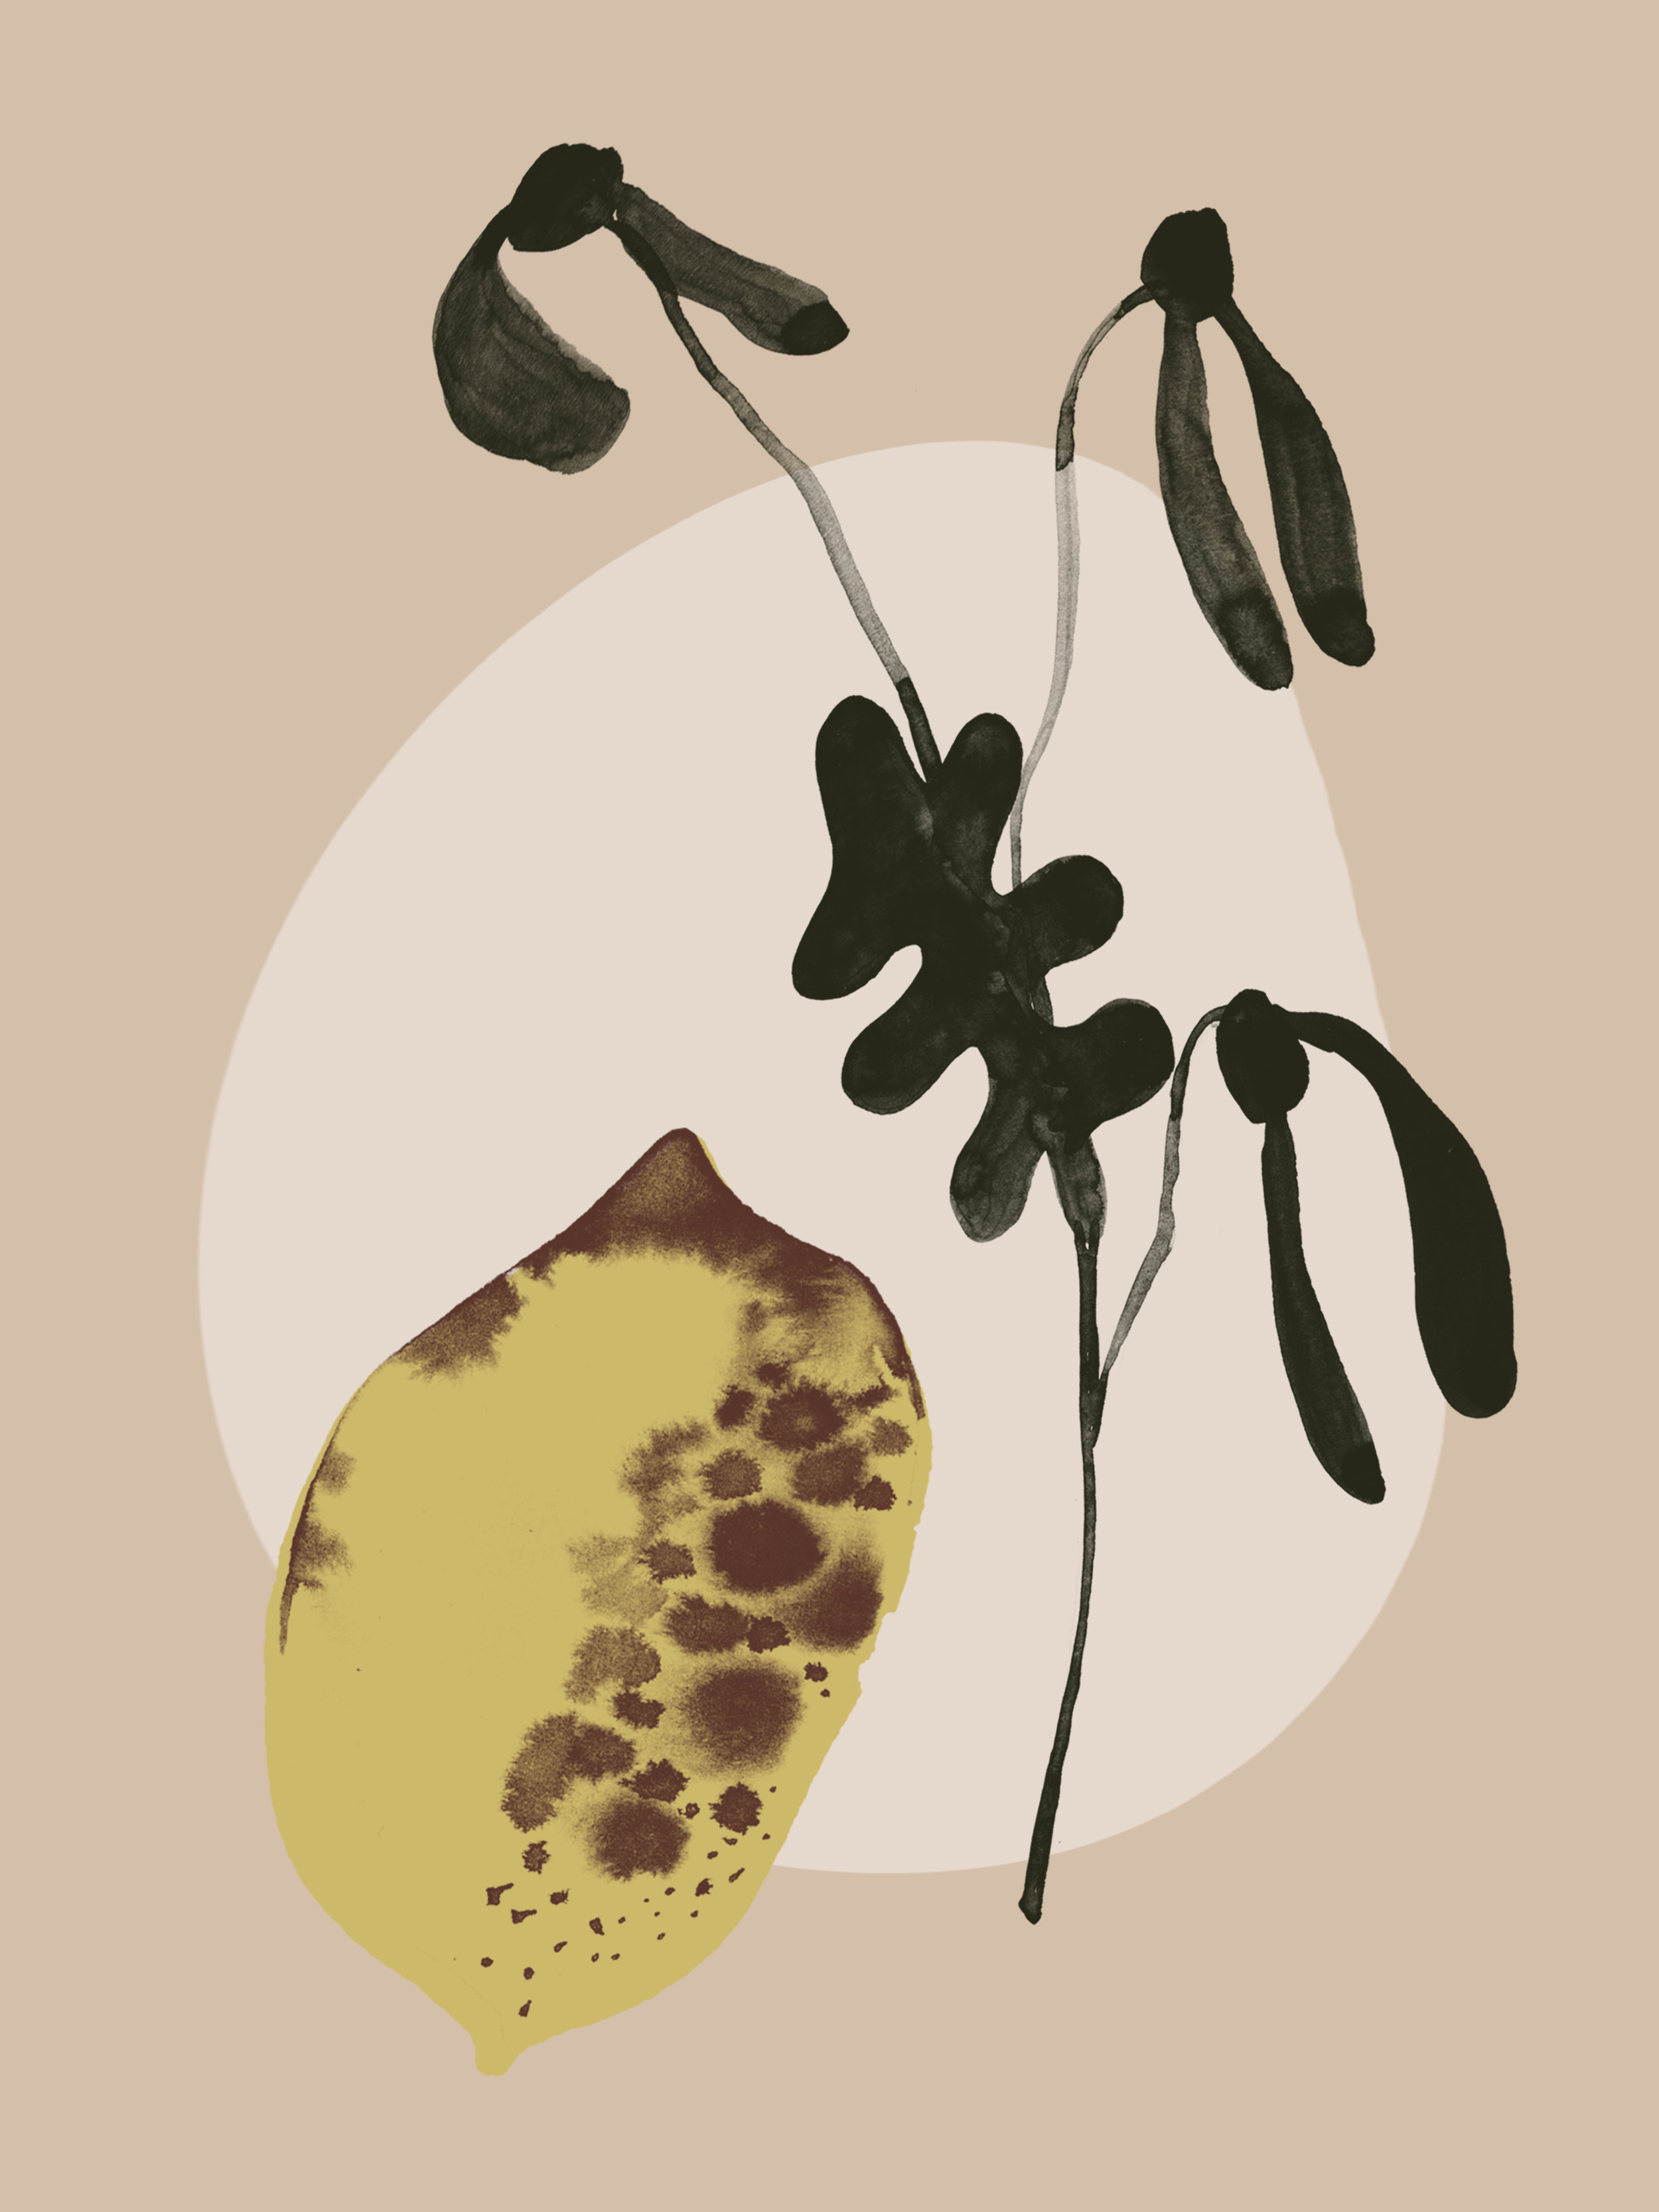 Lemon   Ink and Photoshop  2018, Fruit Series